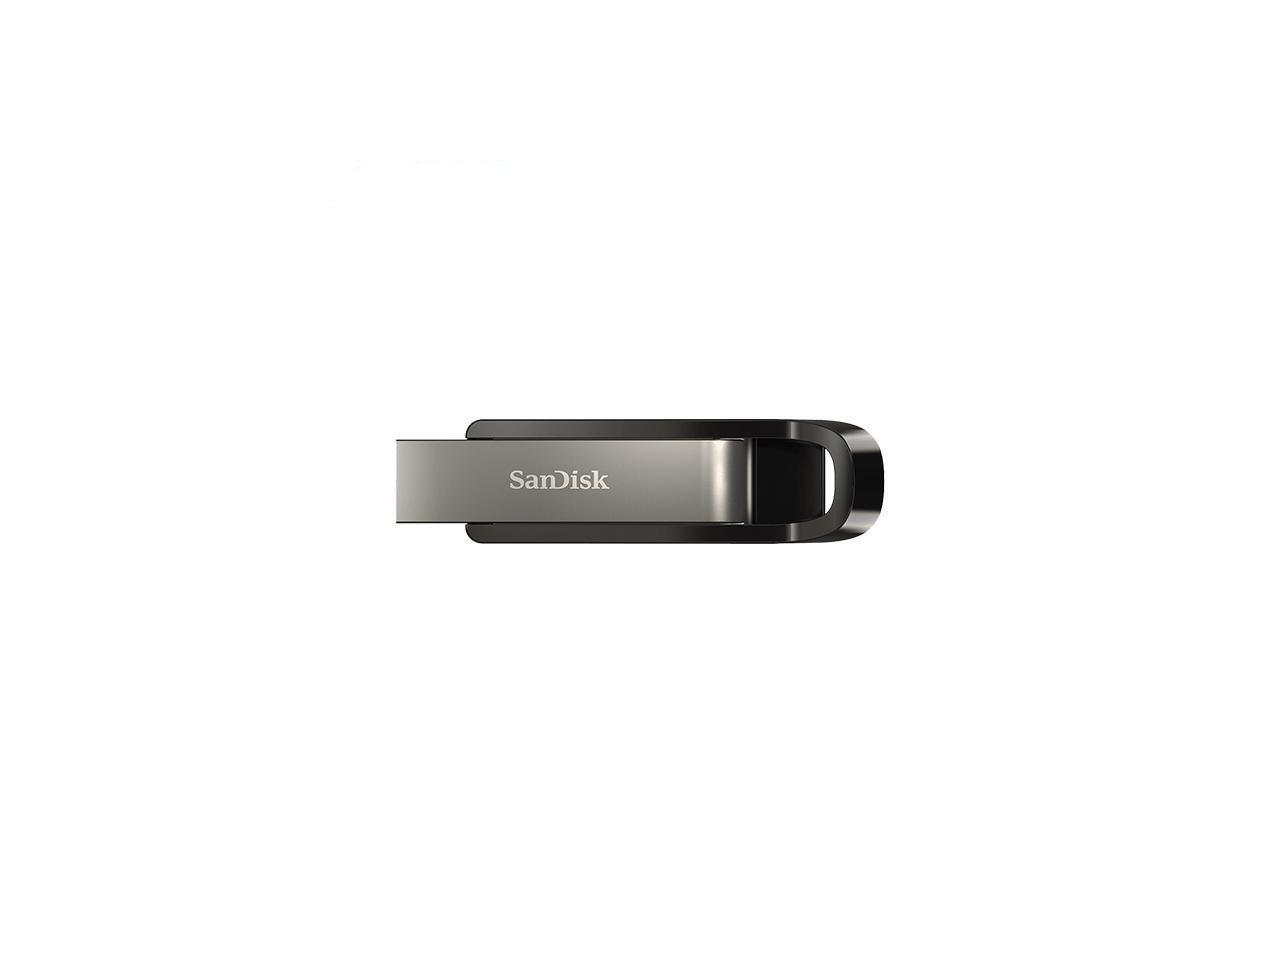 USB памет SanDisk Extreme Go, 256GB, USB 3.2, Черен